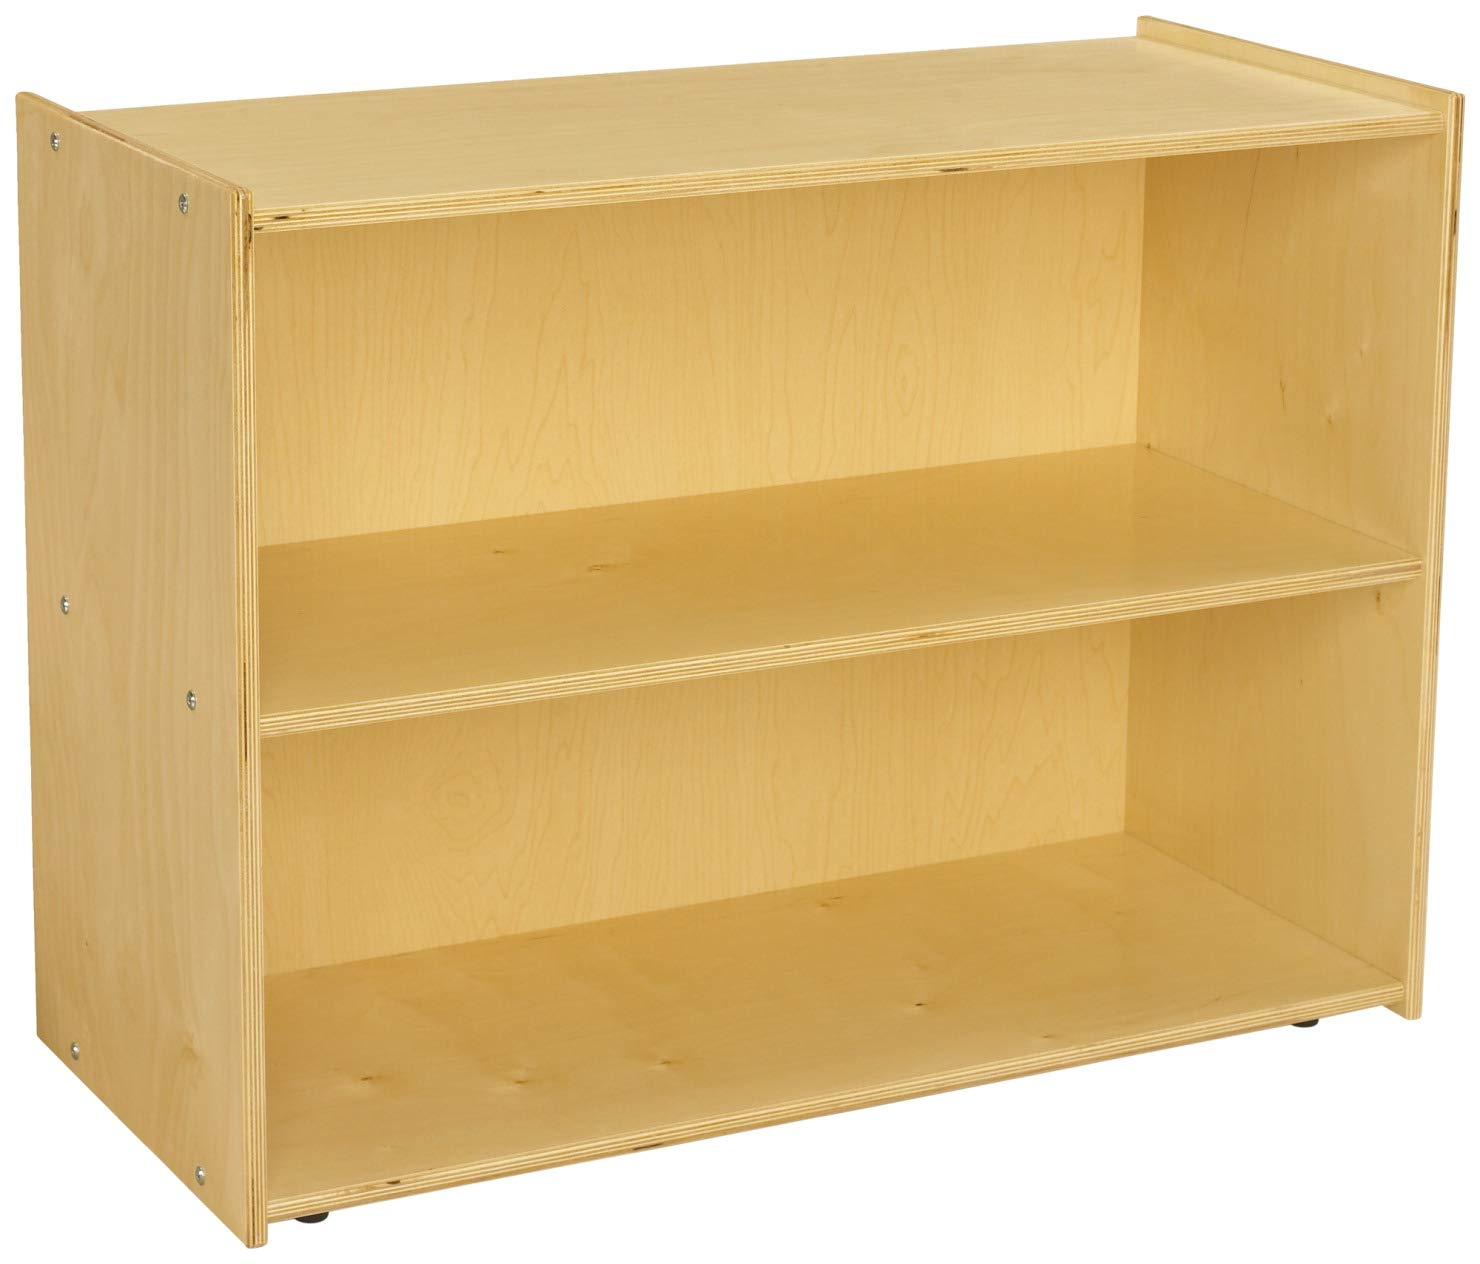 Childcraft ABC Furnishings 2-Shelf Deep Shelf Storage Units, 36 x 16 x 27-3/8 Inches